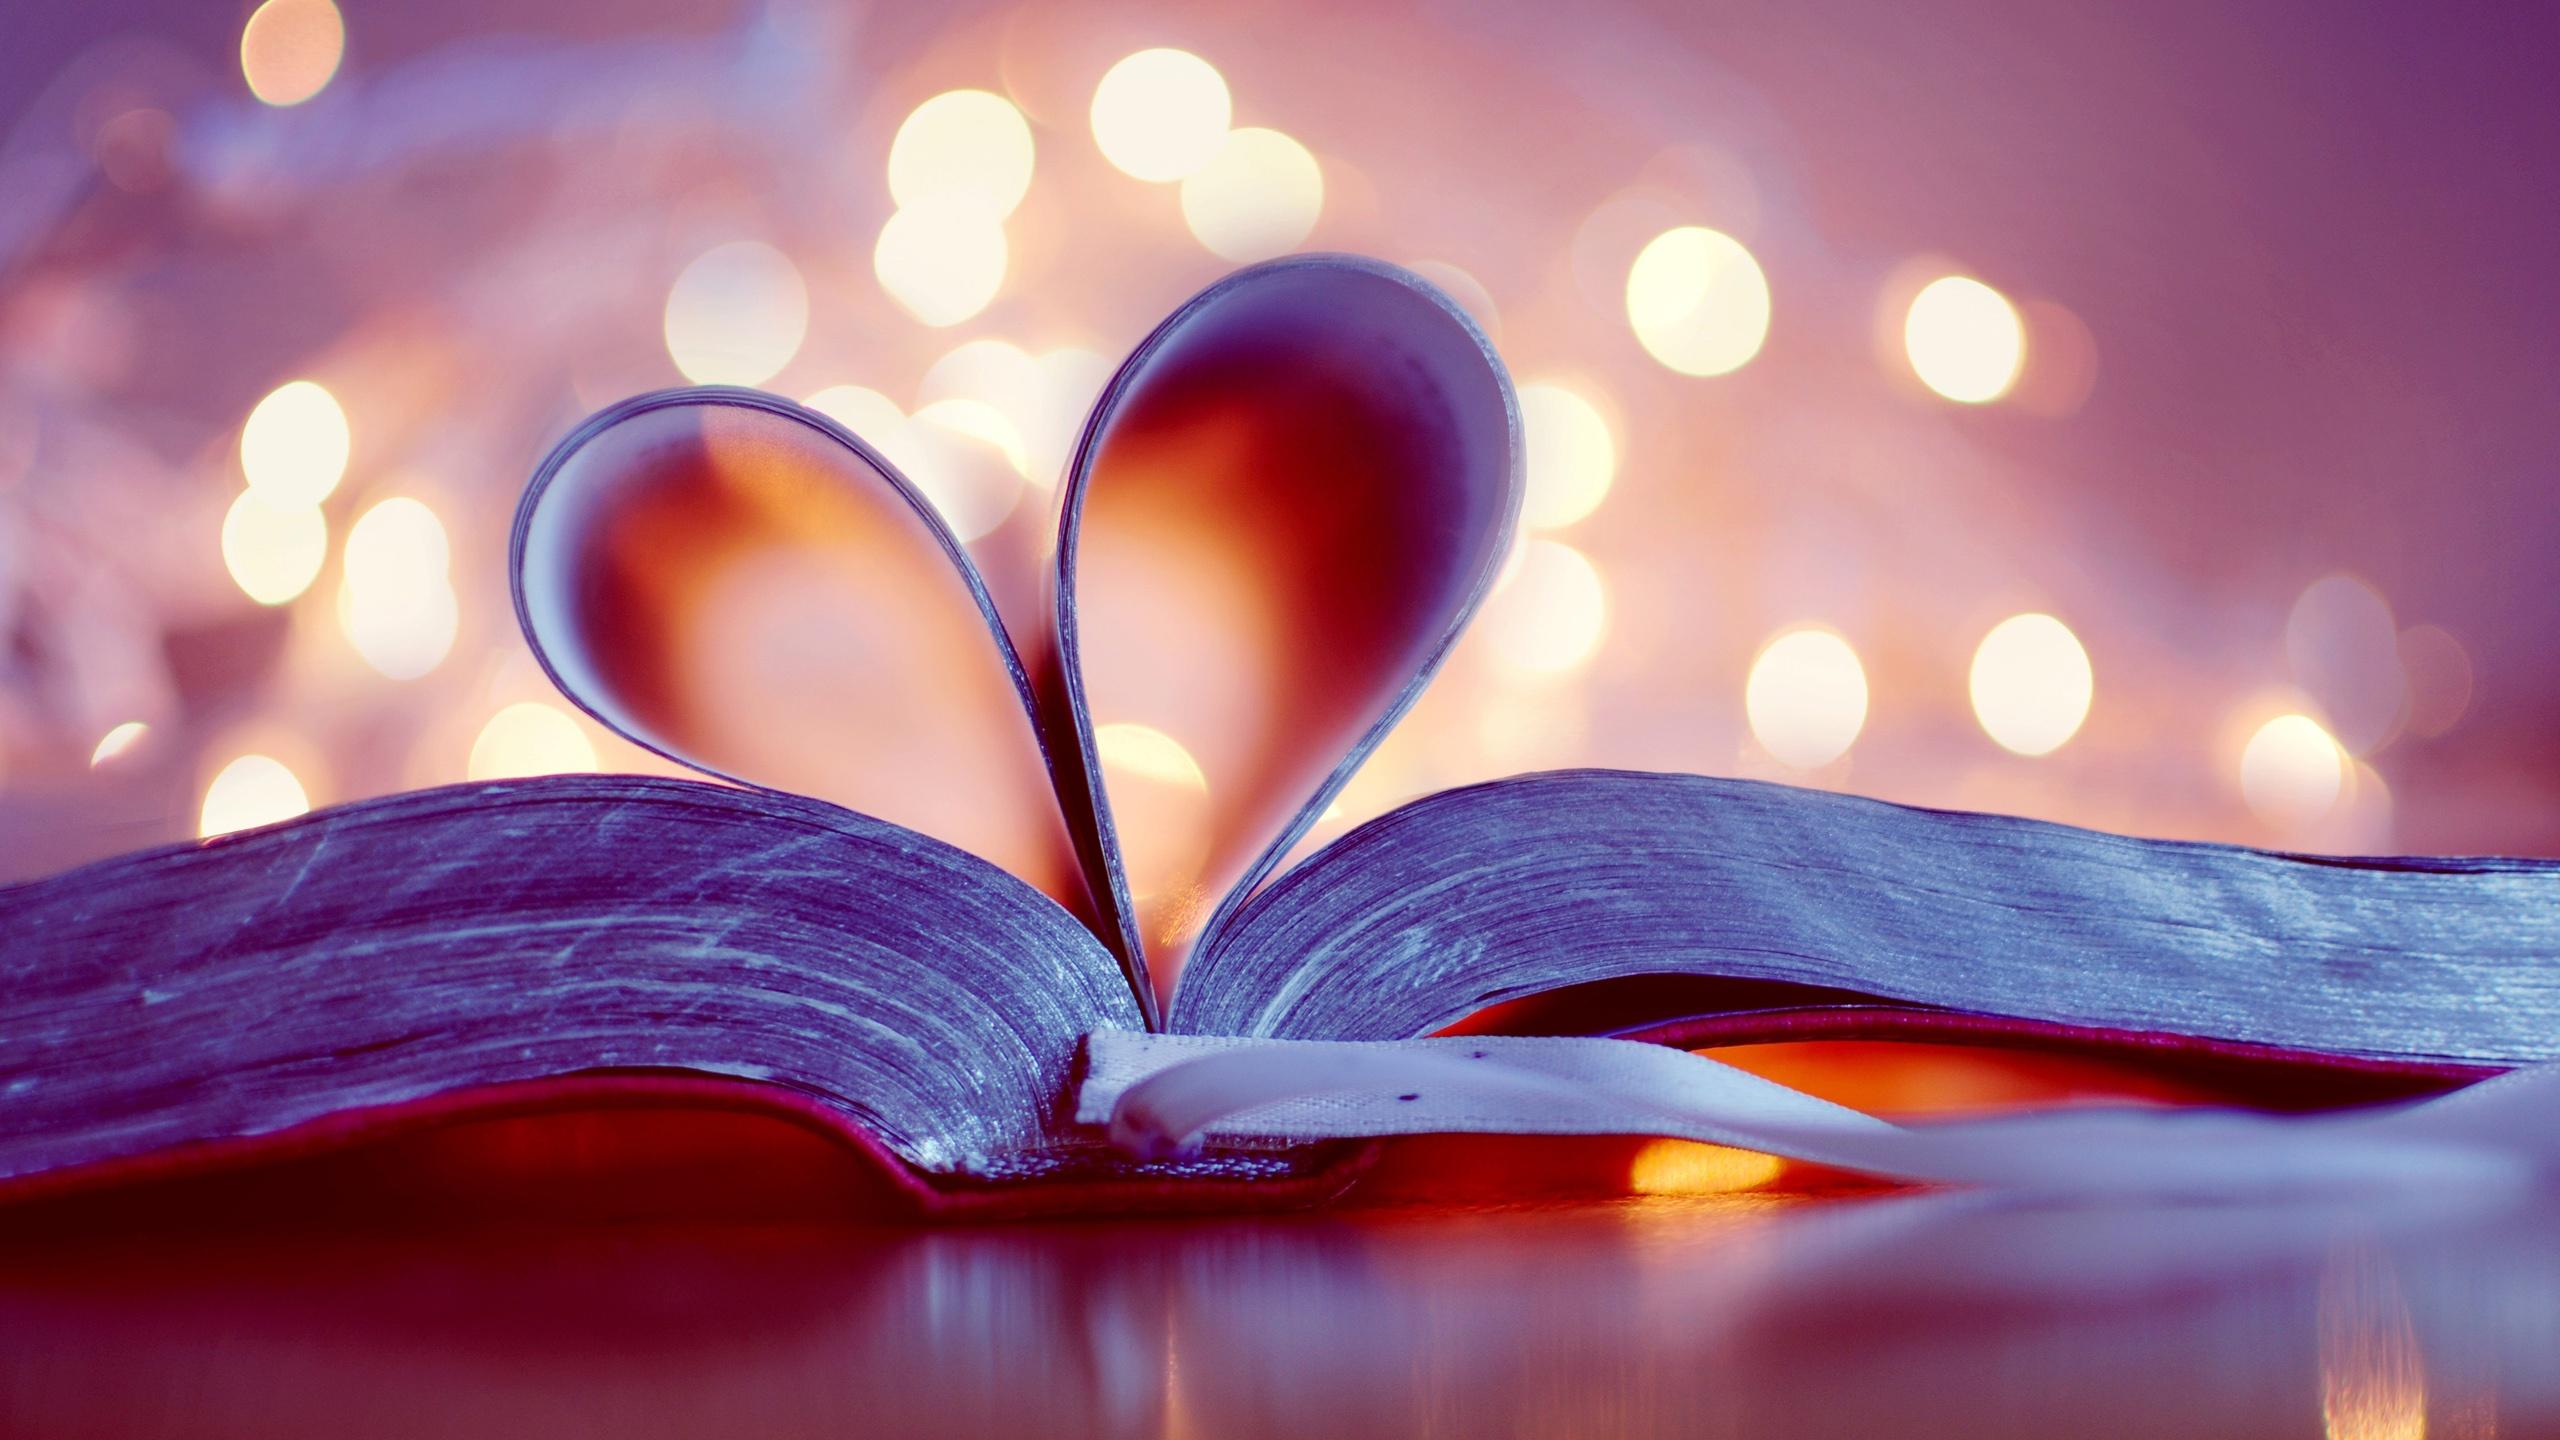 book bookmark love heart blurred background wallpaper